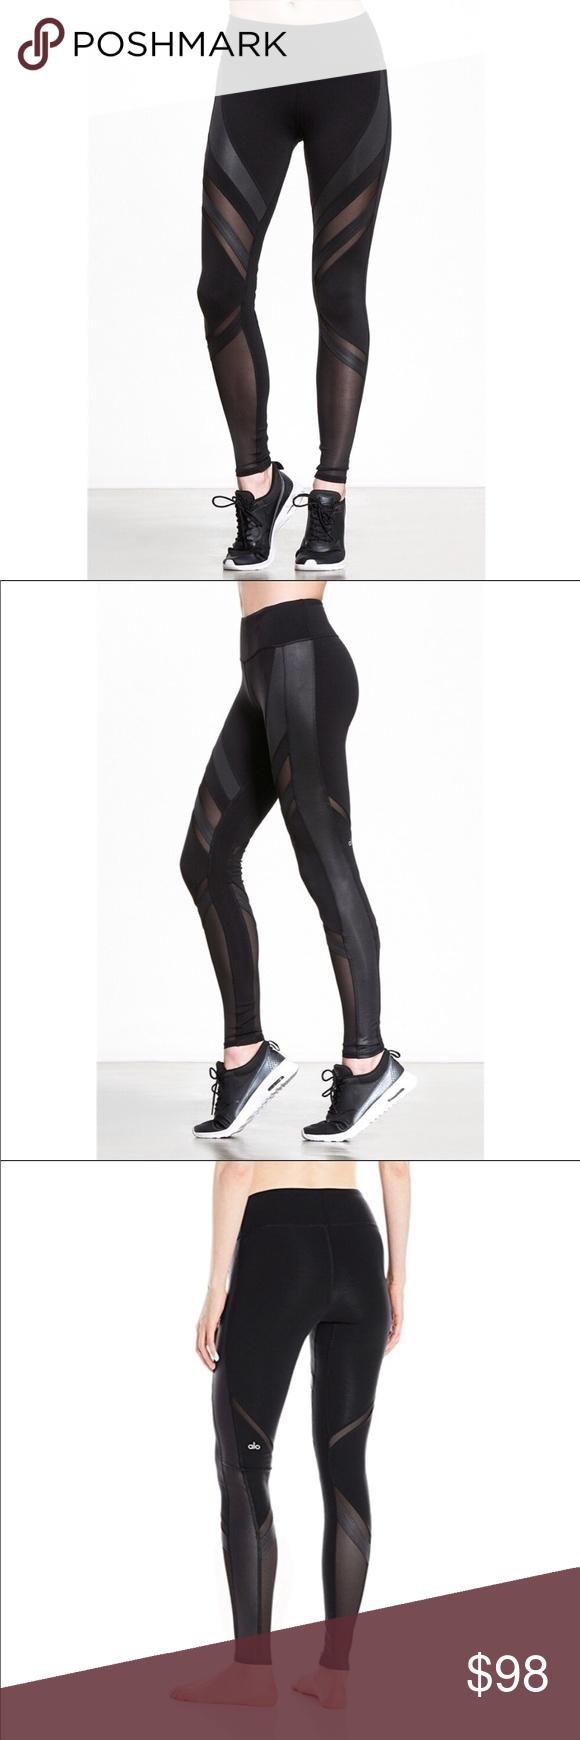 51ef30fbb8 NWT ALO Yoga Epic Legging Brand new with tag ALO Yoga Epic Leggings sexy  leggings with